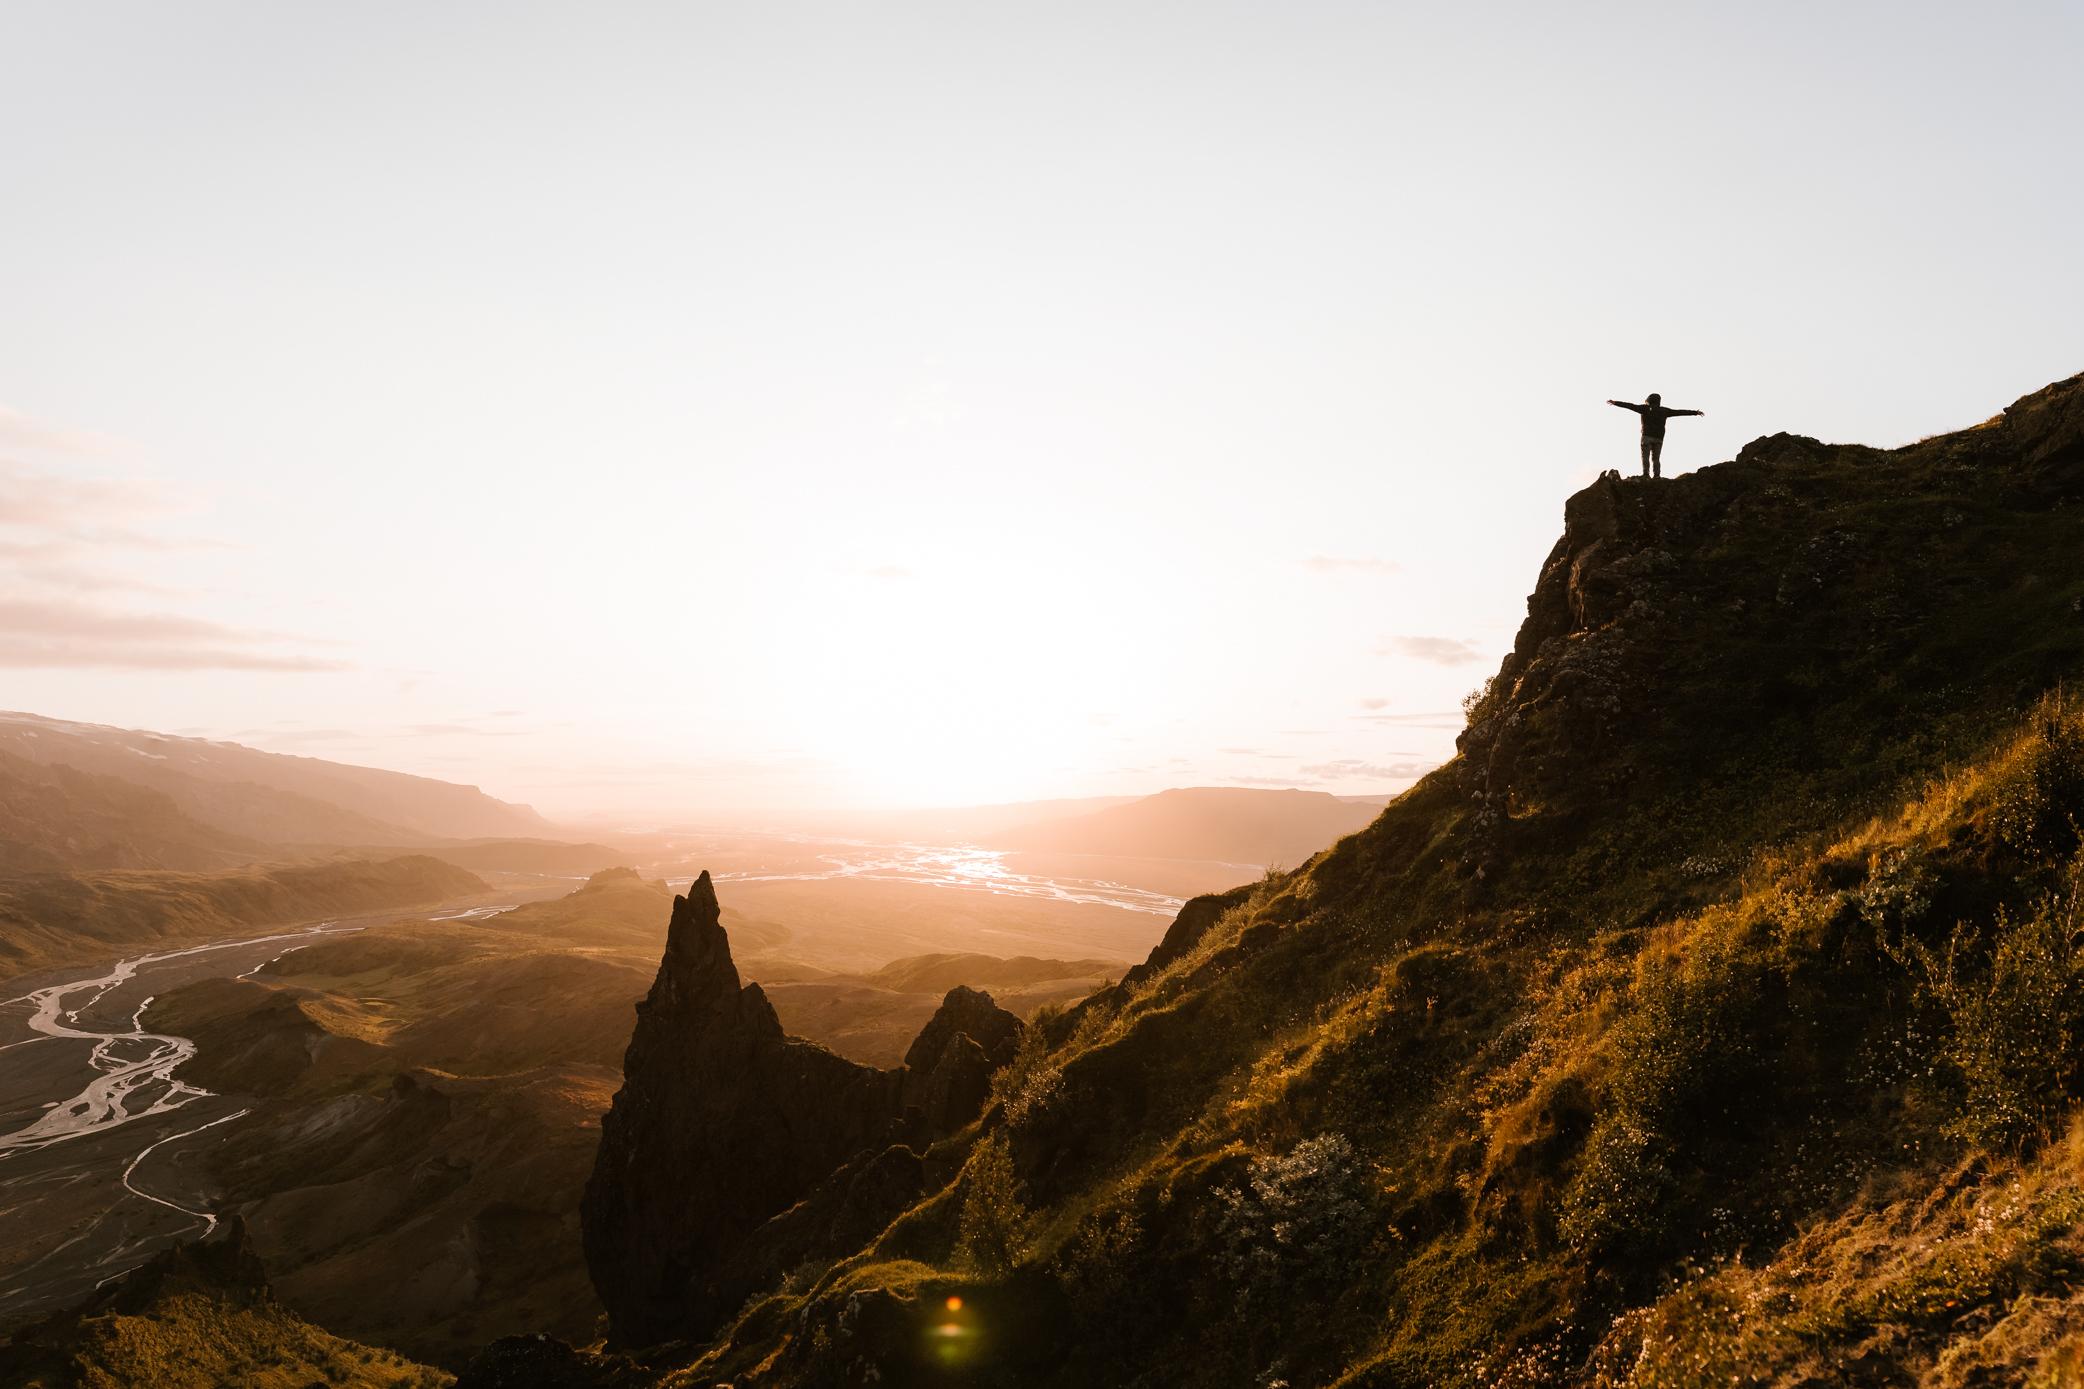 Explore the Golden Thórsmörk, Iceland with Marina Weishaupt